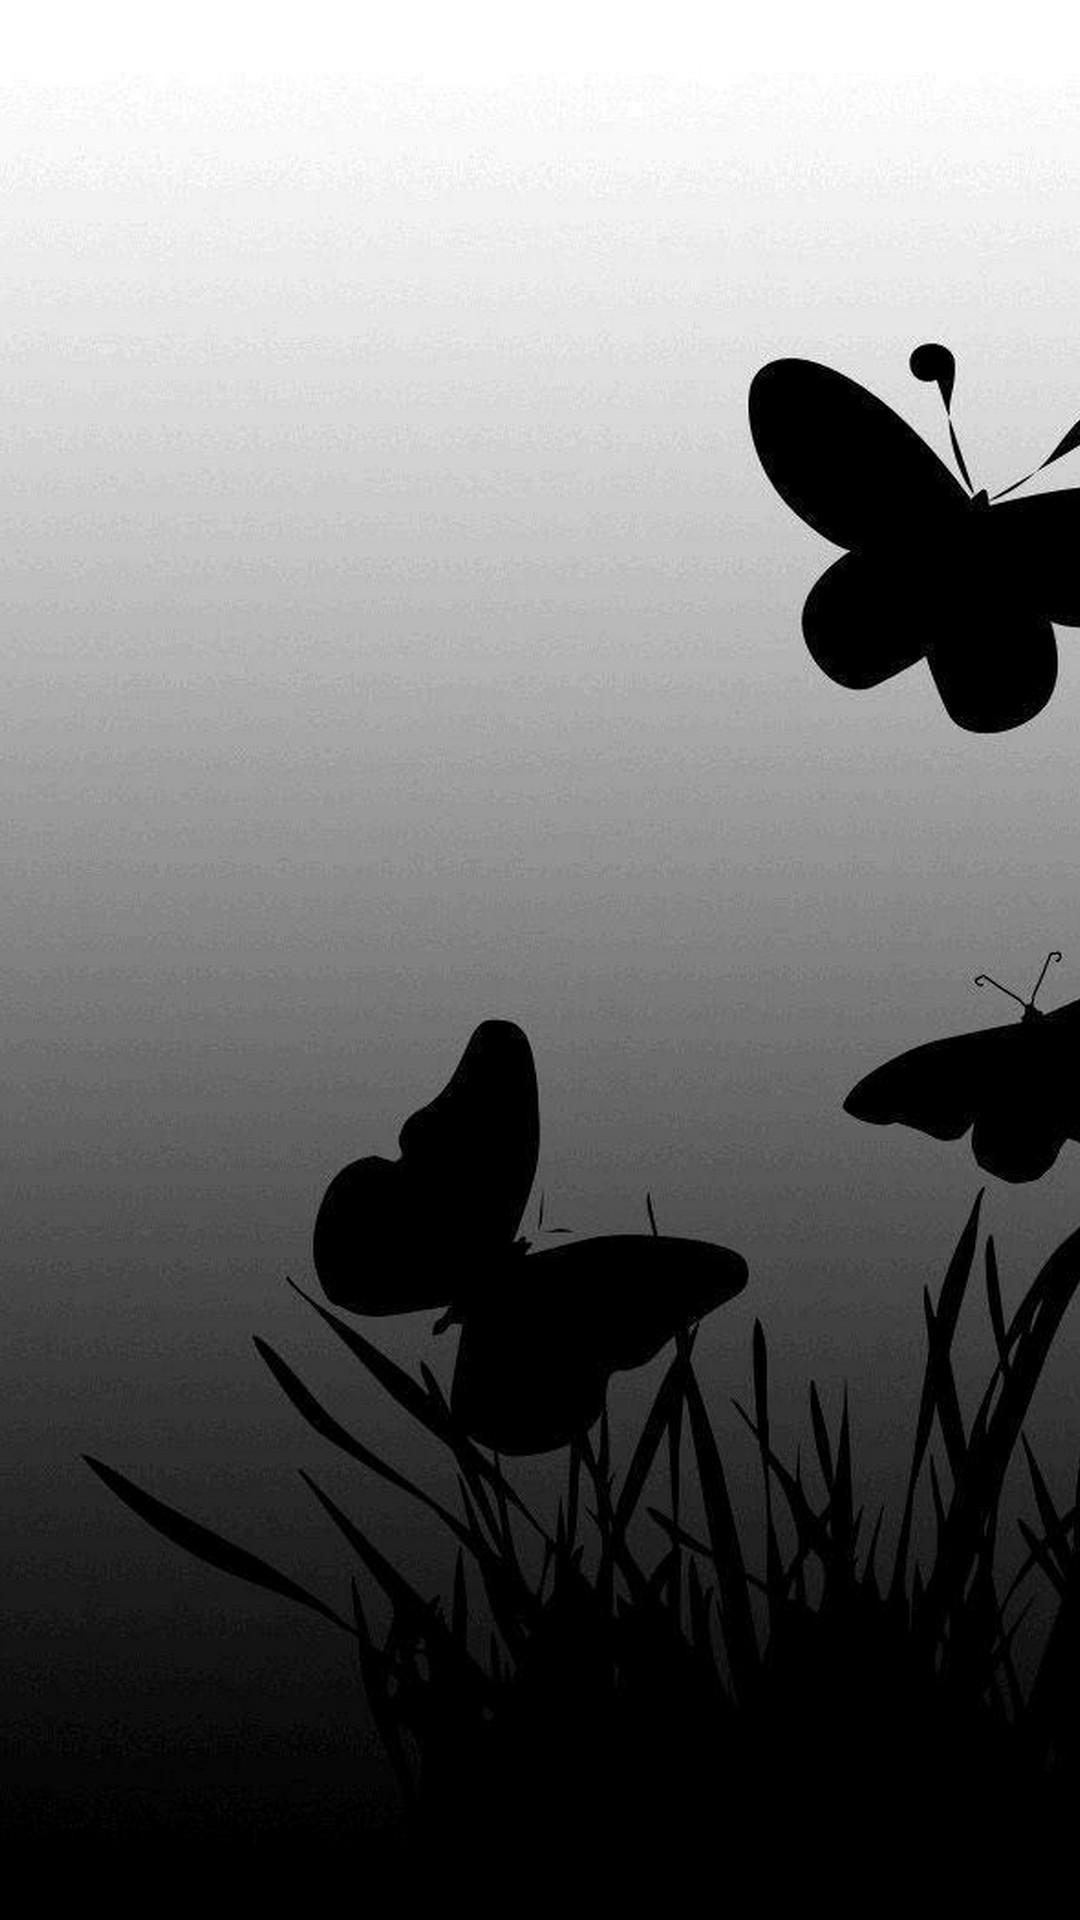 Iphone Wallpaper Hd Cute Butterfly 2020 Live Wallpaper Hd